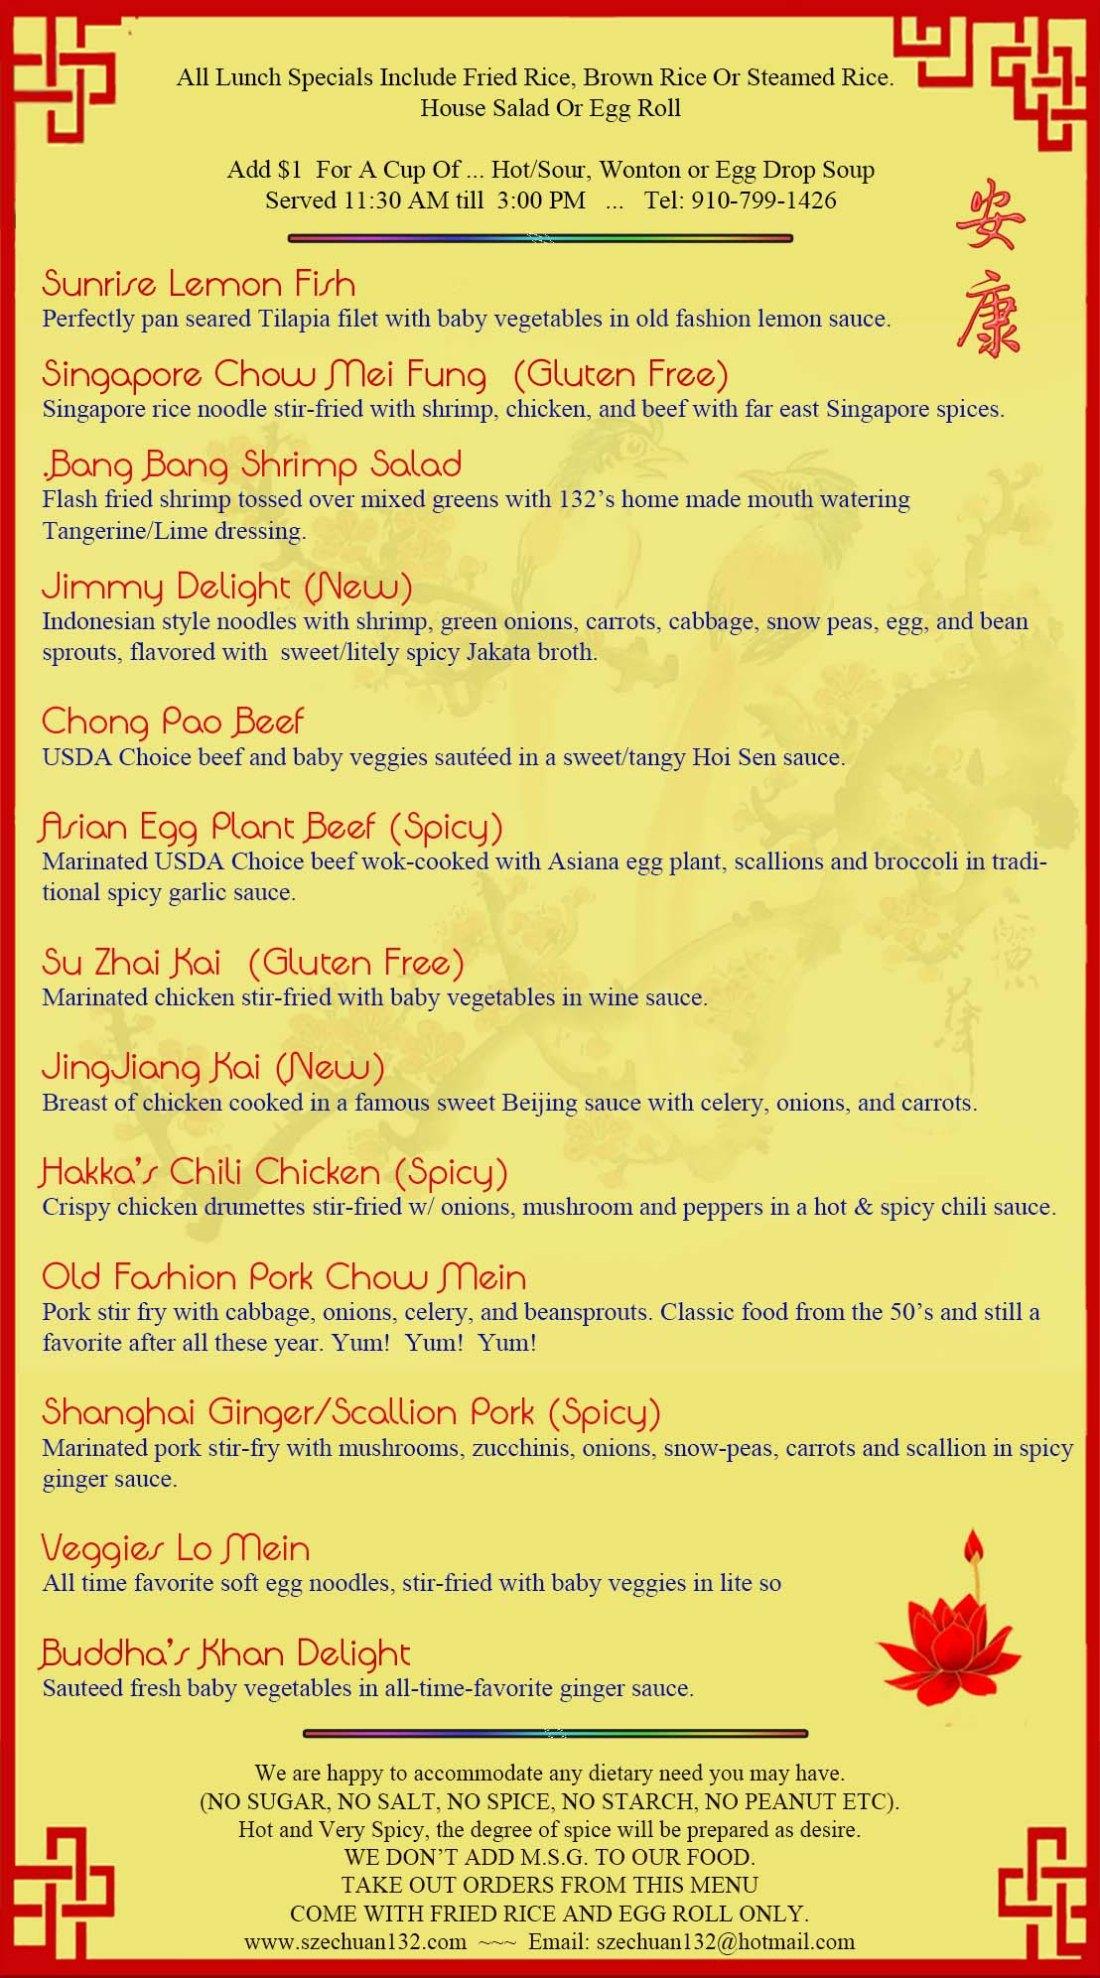 03-08-20 Lunch menu